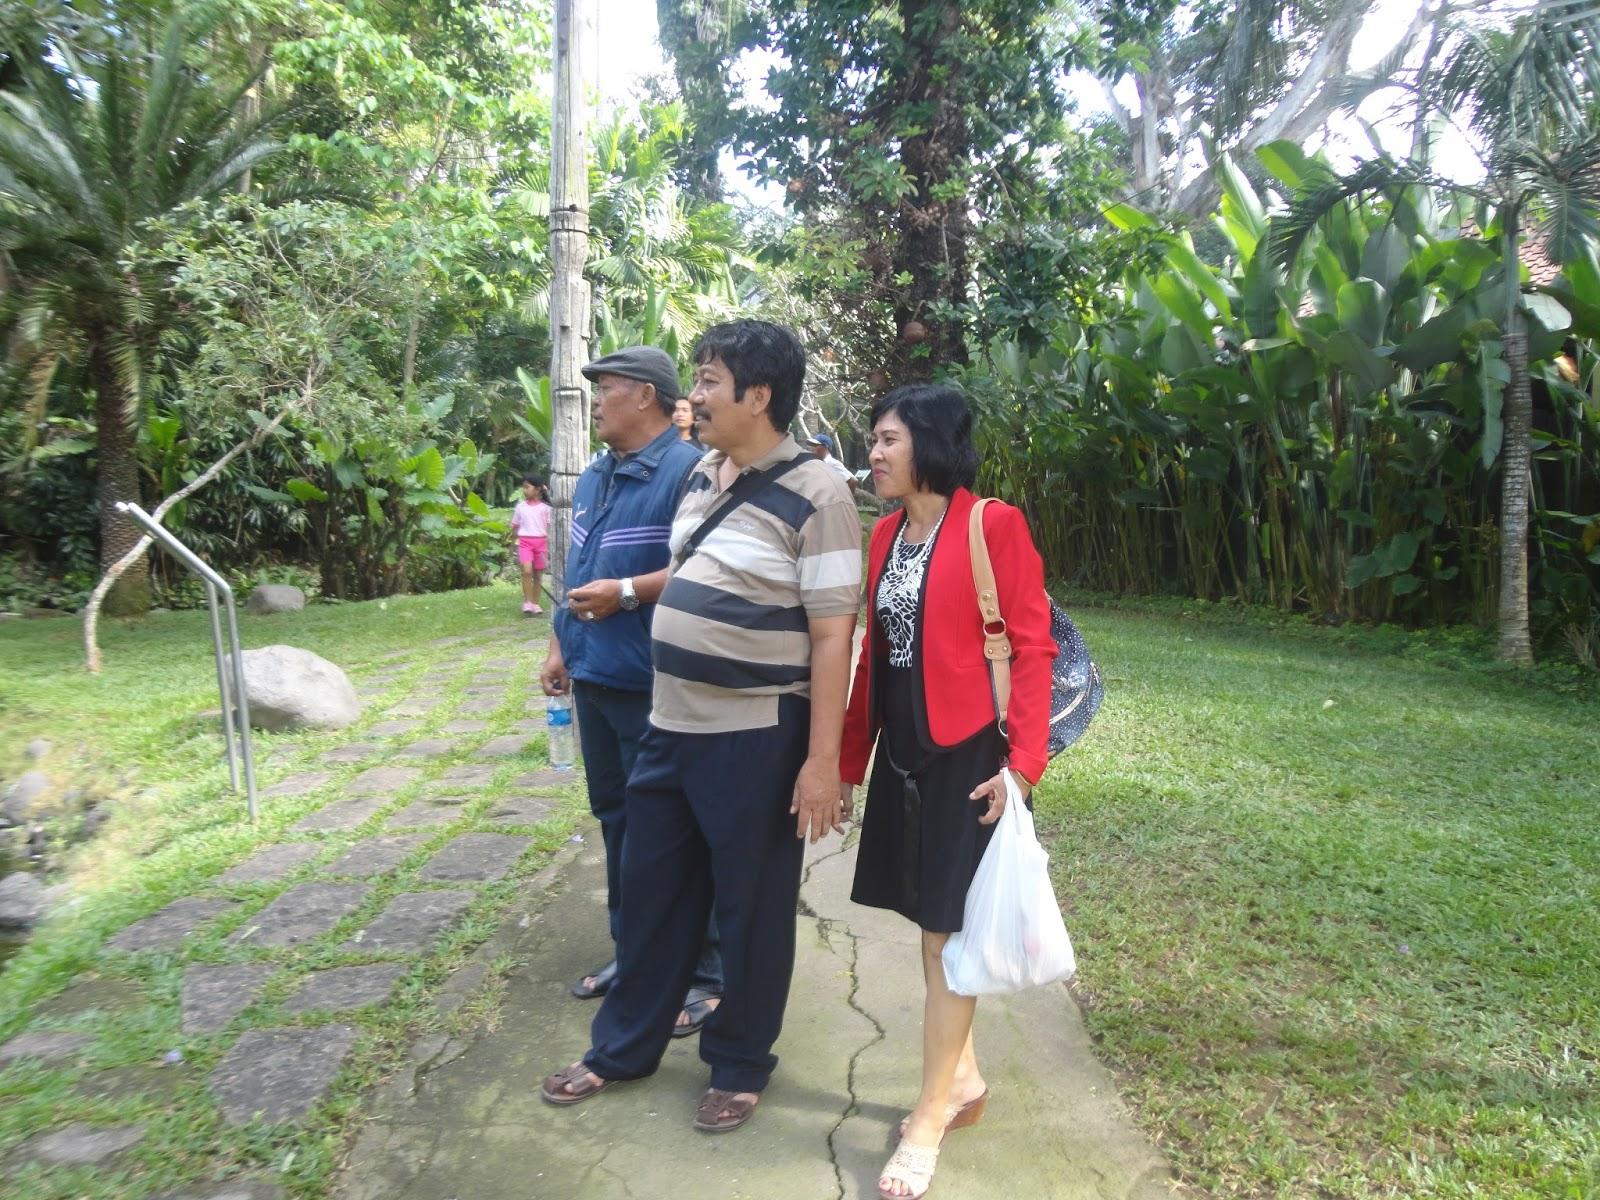 Smp Lab Undiksha Karya Wisata Bali Bird Park Secret Garden